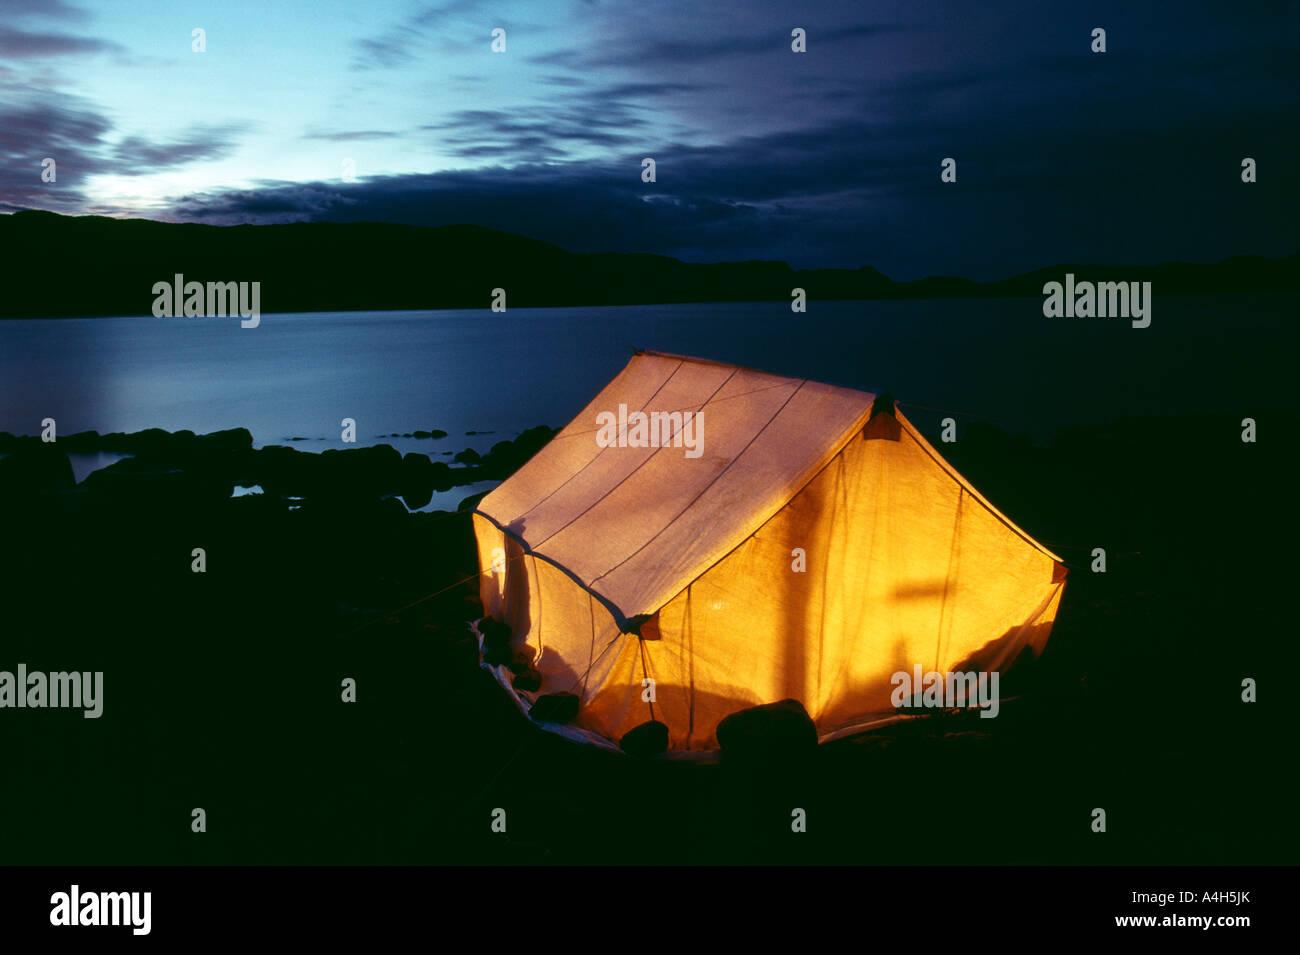 Inuit Tent Camp, Kekerten Island, Historic Whaling Village, Northwest Territories, Canada, - Stock Image